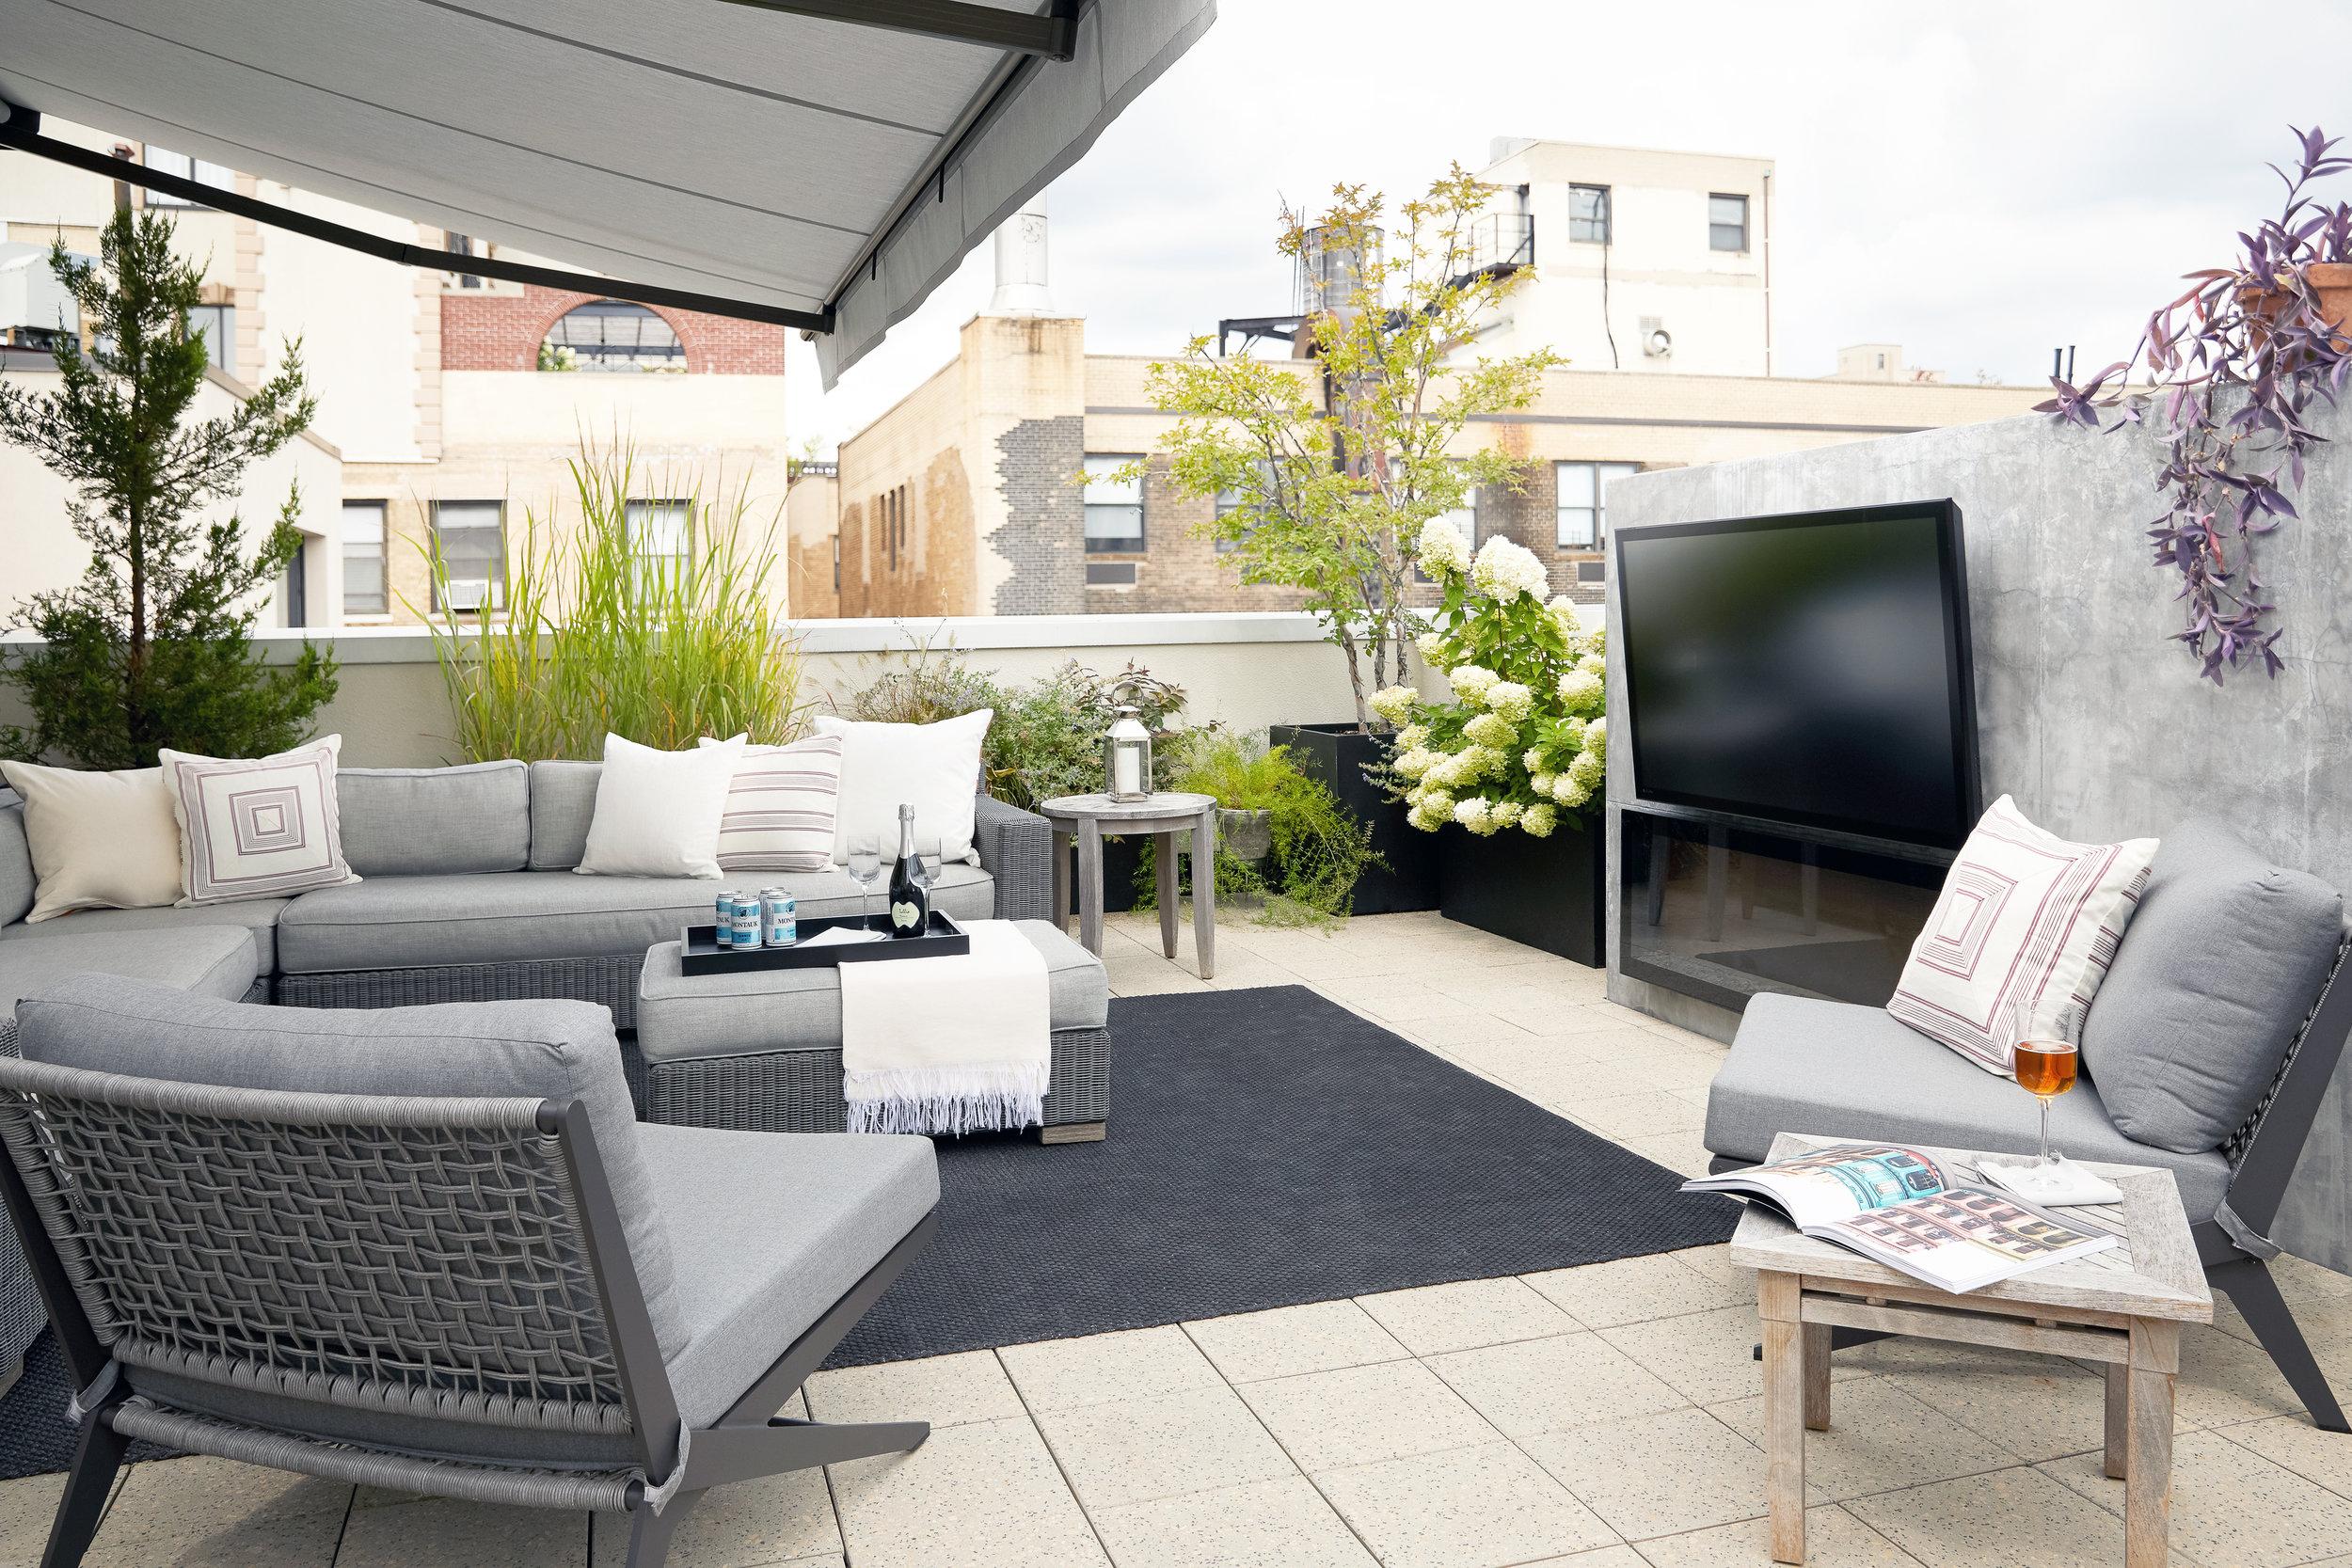 115-duplex-apartment-renovation-terrrace